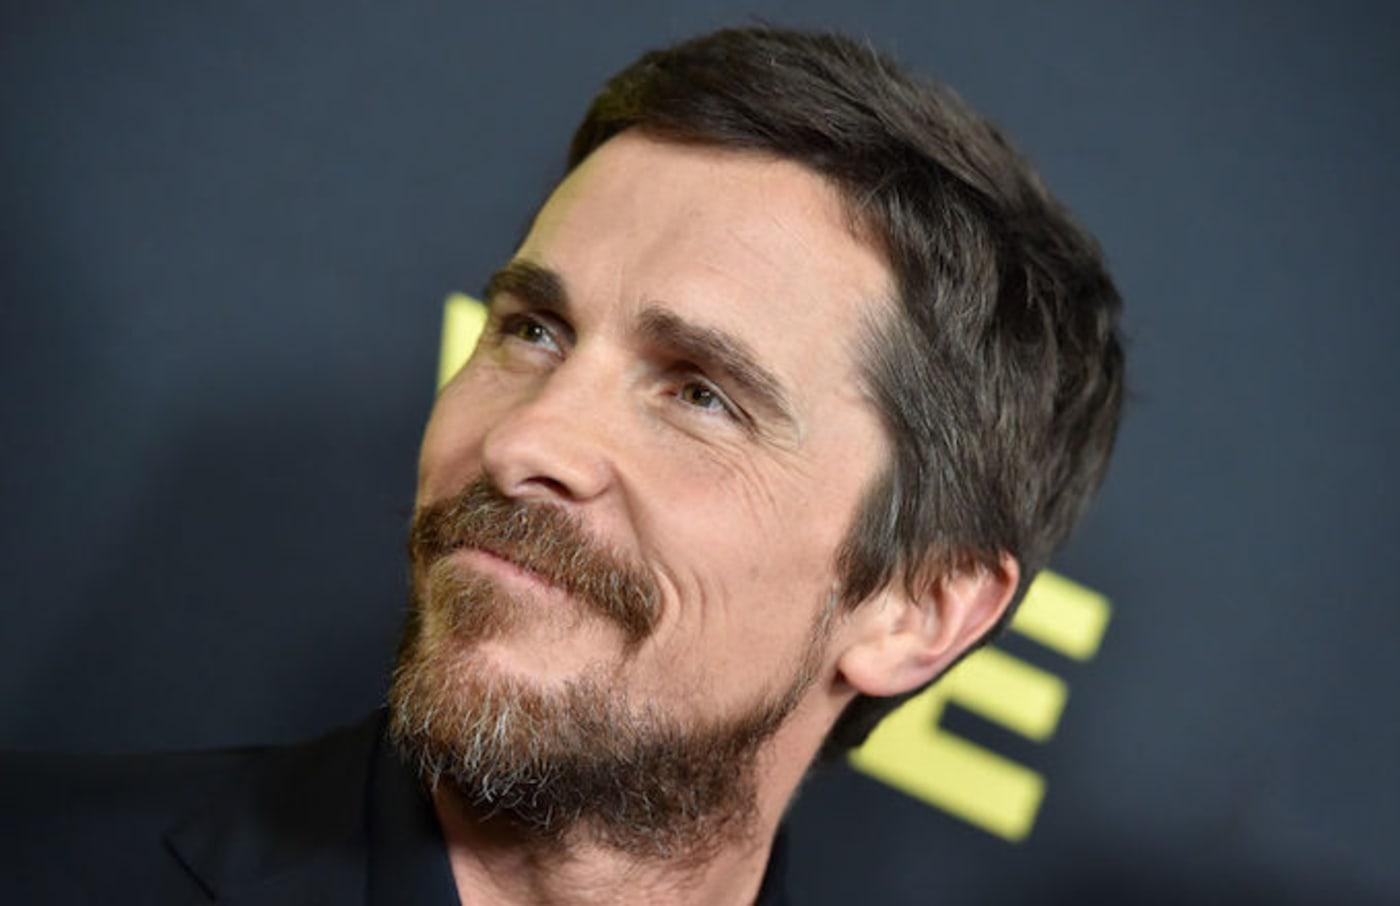 Christian Bale meeting Trump